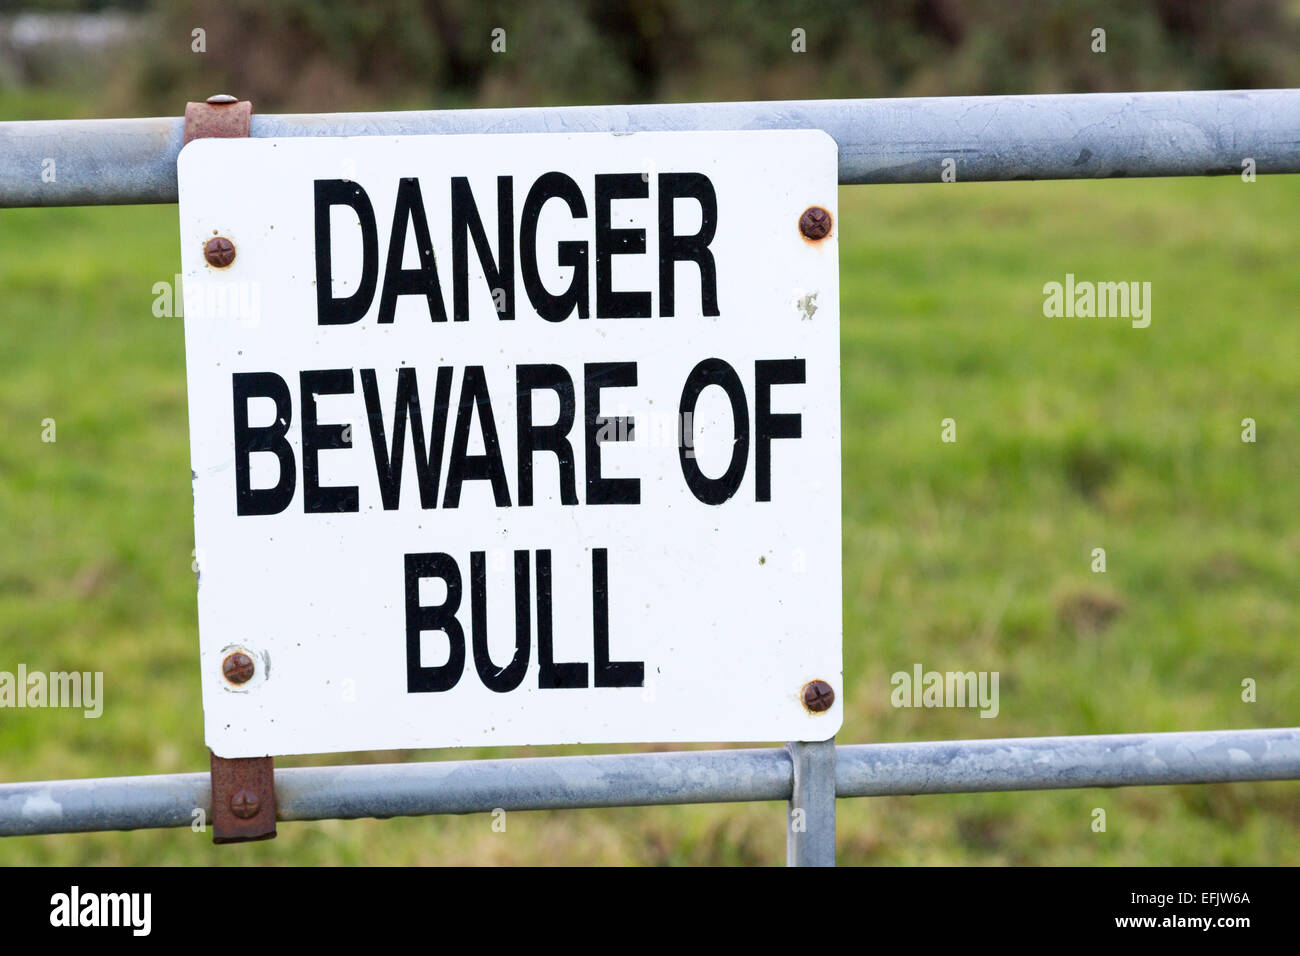 Danger beware of the bull sign on farm gate, Burren, County Clare, Ireland - Stock Image